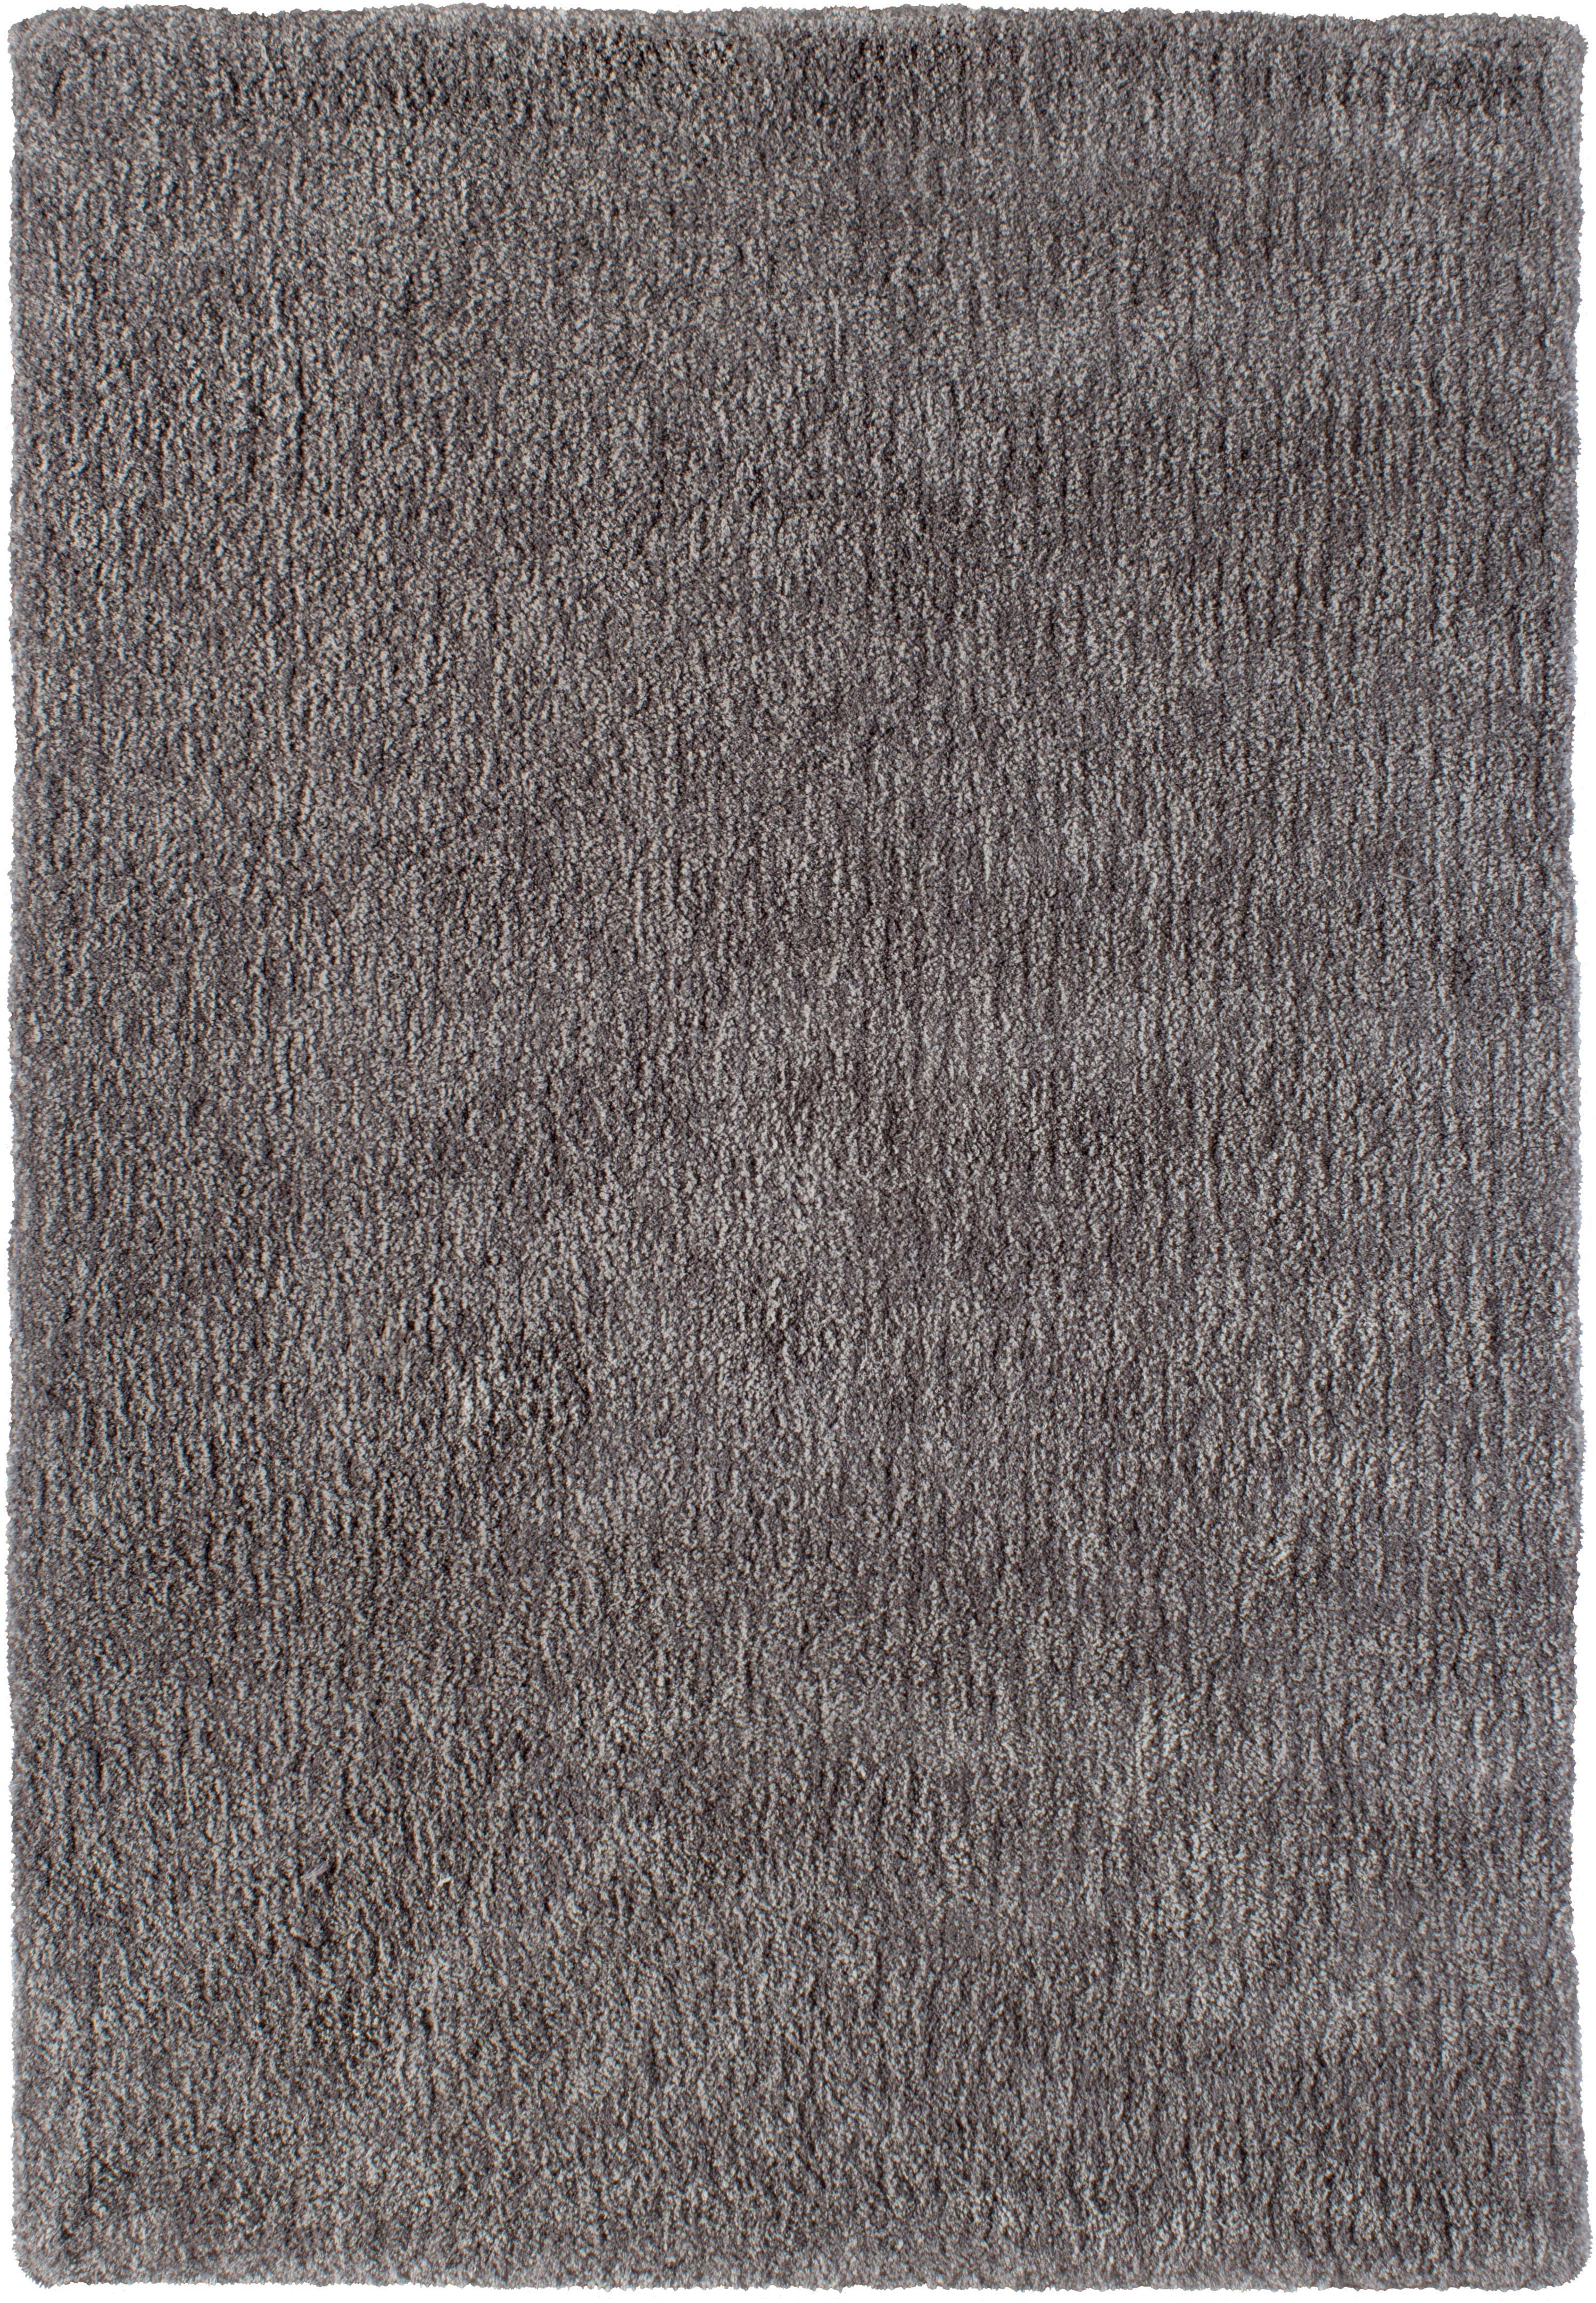 Hochflor-Teppich, Touch, Barbara Becker, rechteckig, Höhe 27 mm, handgetuftet | Heimtextilien > Teppiche > Hochflorteppiche | Taupe | barbara becker